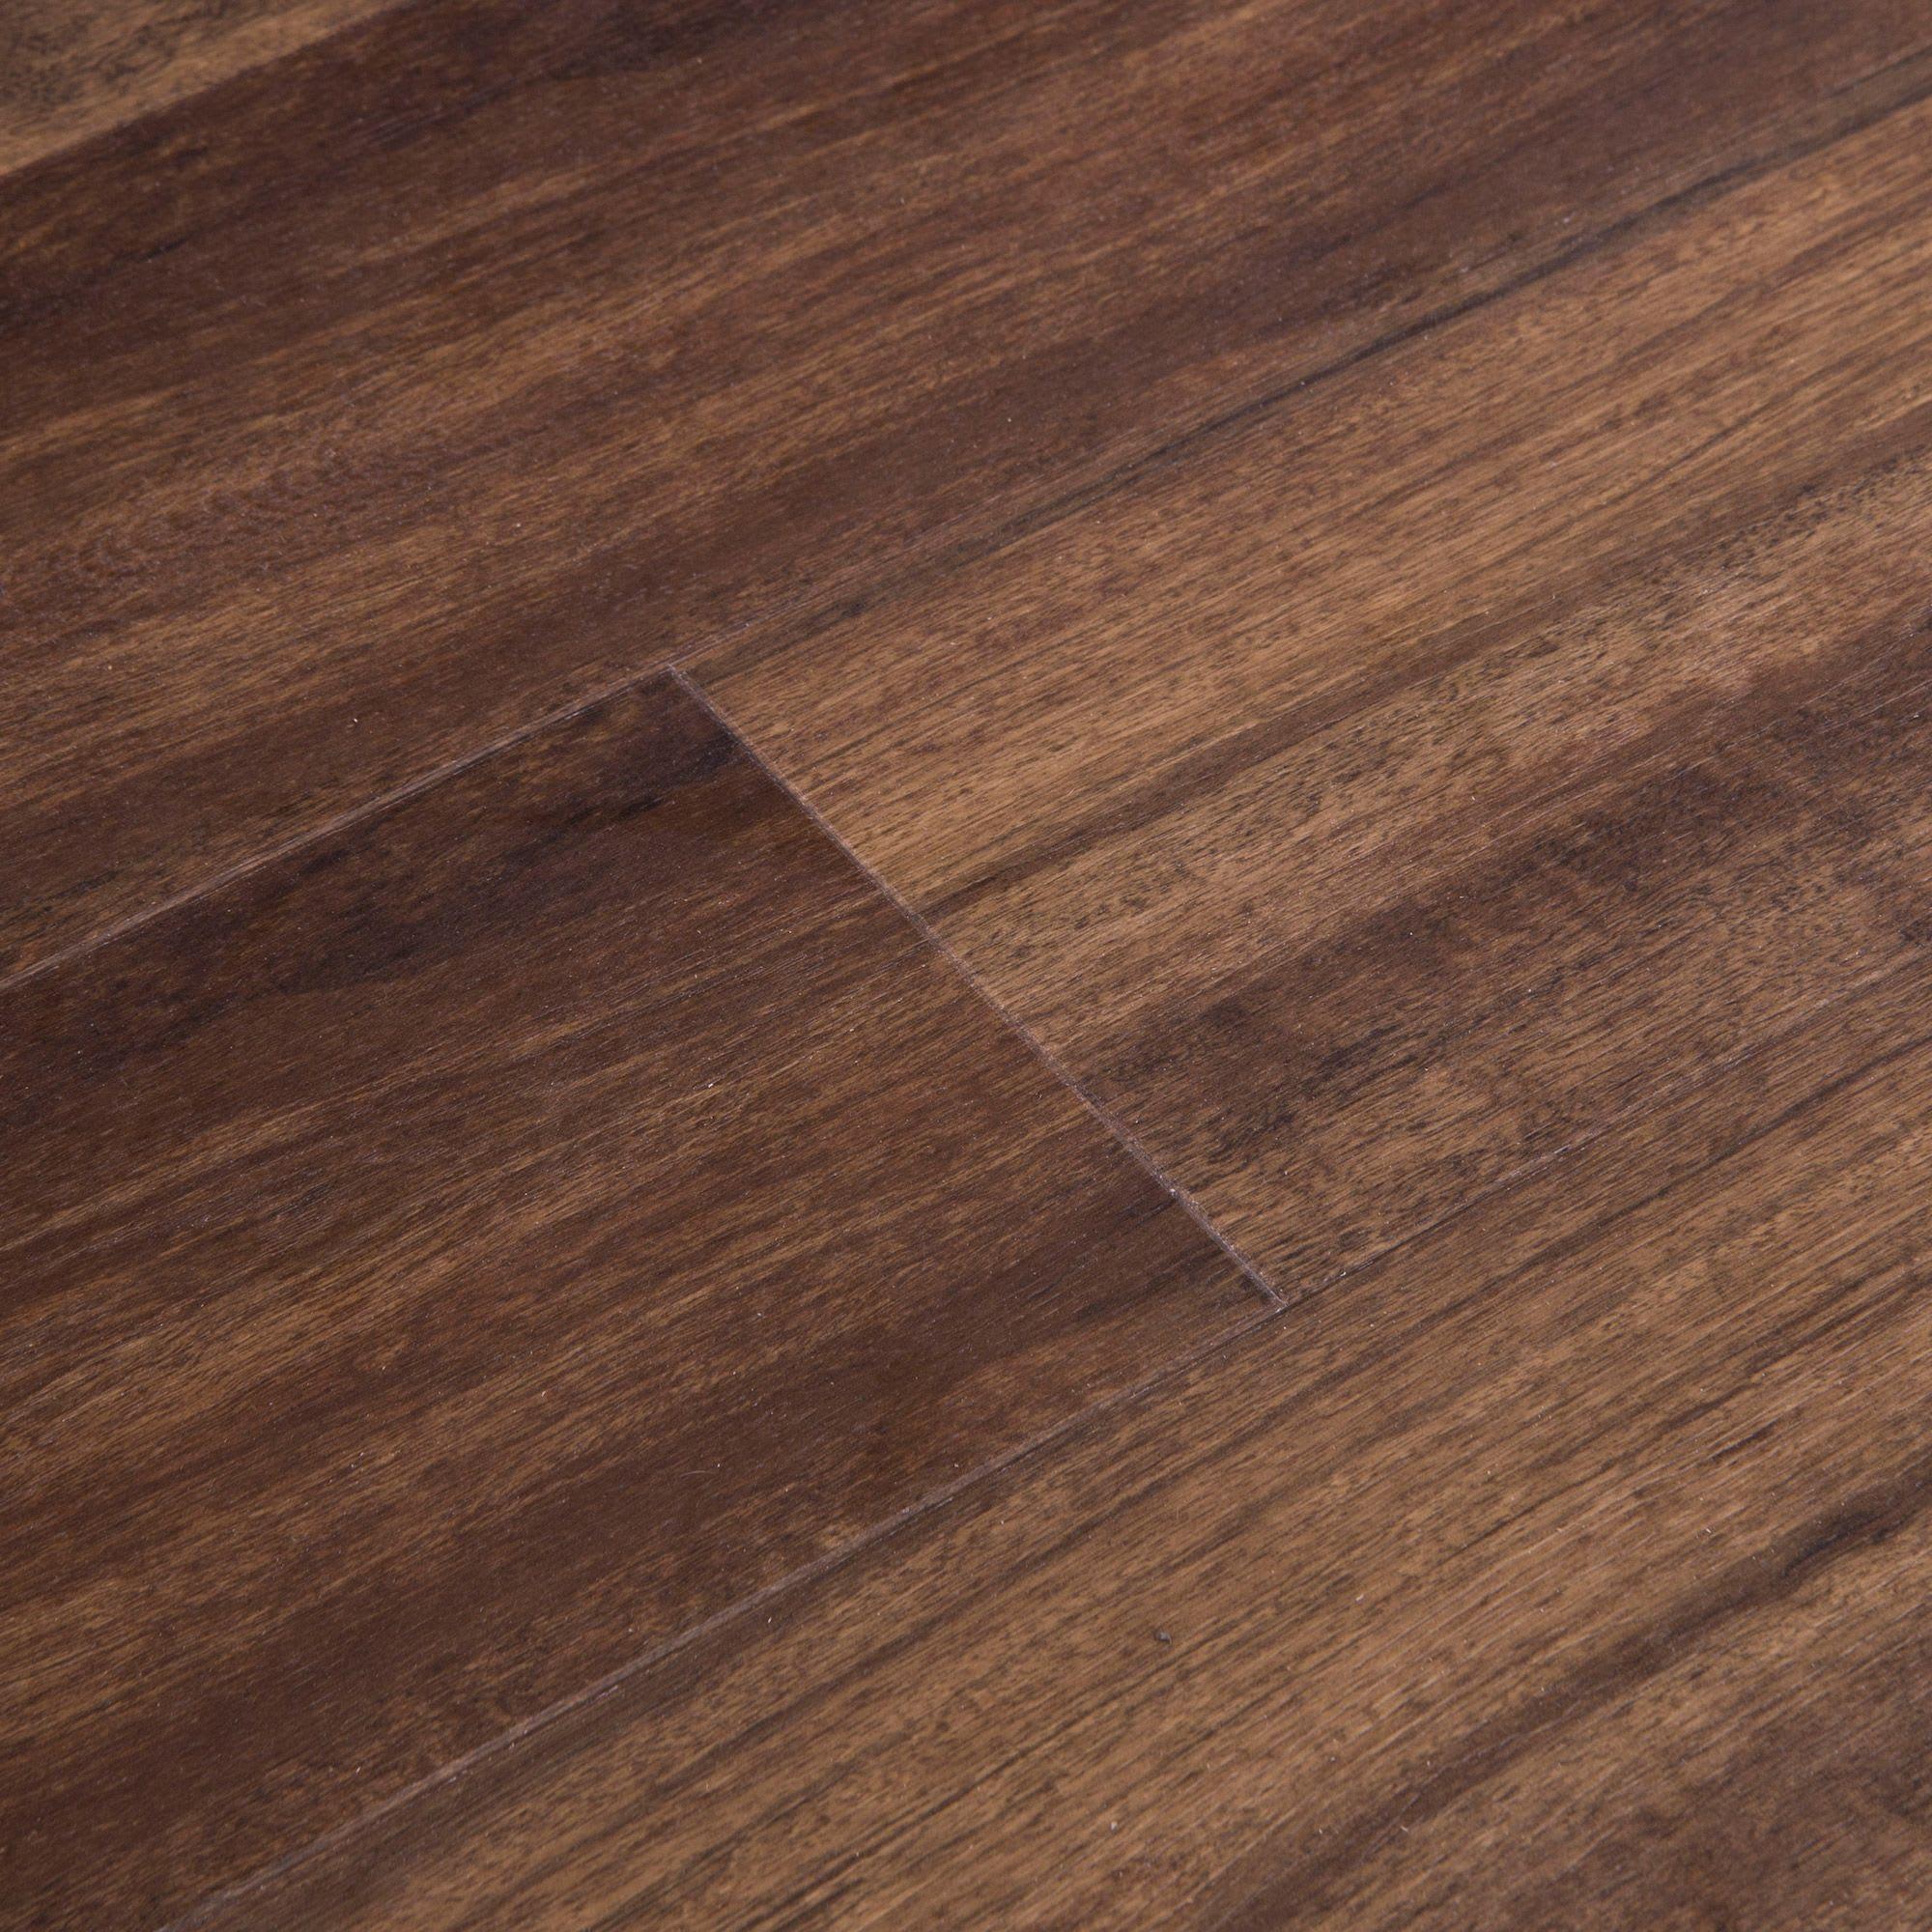 Cali Vinyl Hickory Brook Pro Wide And Click Vinyl Plank Flooring